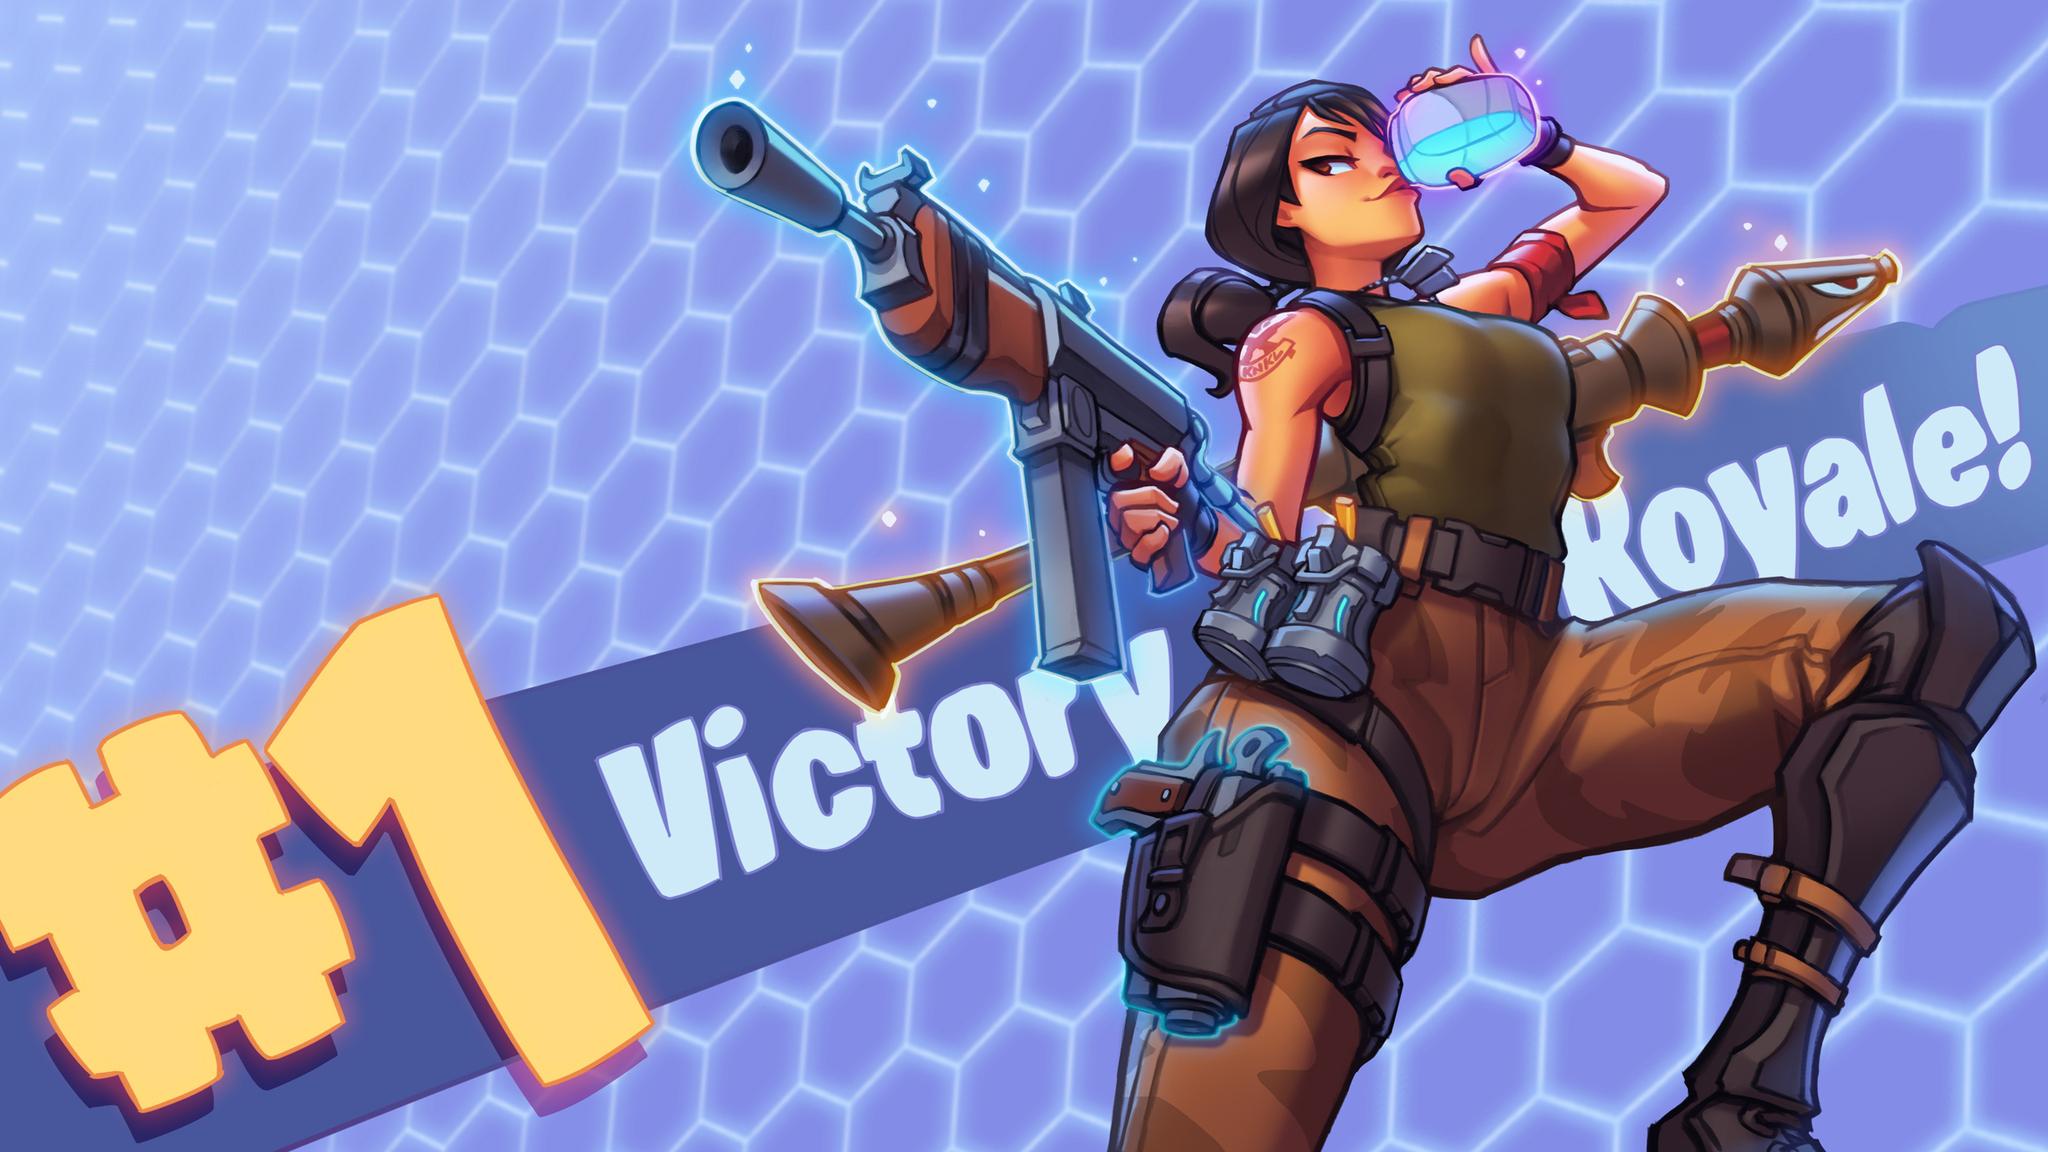 2048x1152 Fortnite 2018 Victory Royale 2048x1152 Resolution